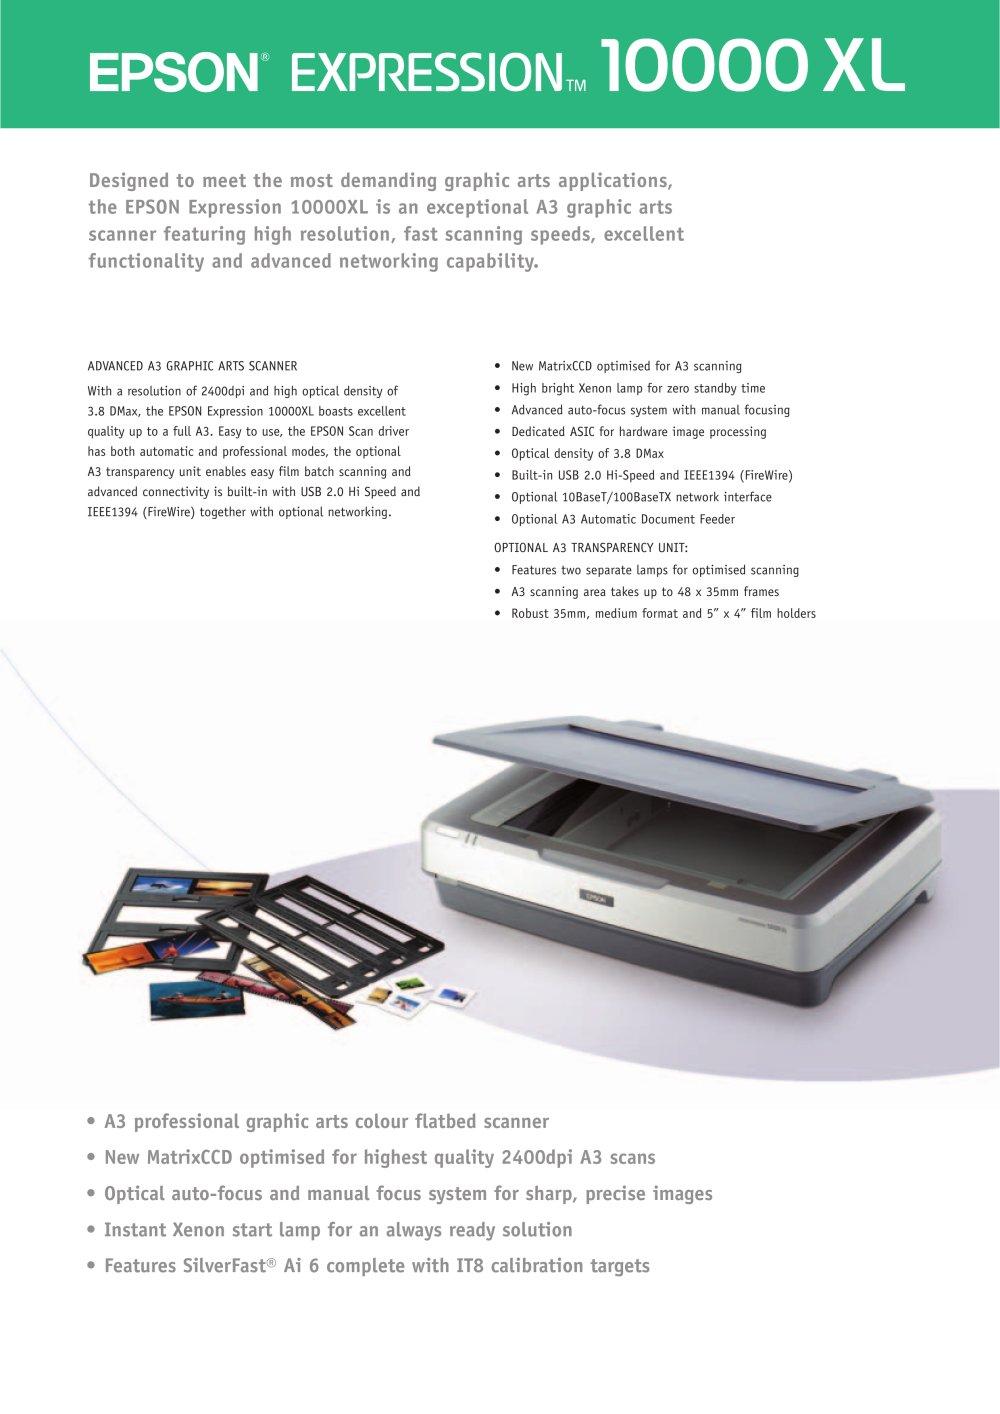 epson expression 10000xl a3 graphics scanner epson europe pdf rh pdf directindustry com manuel scanner epson v500 epson scanner manual download